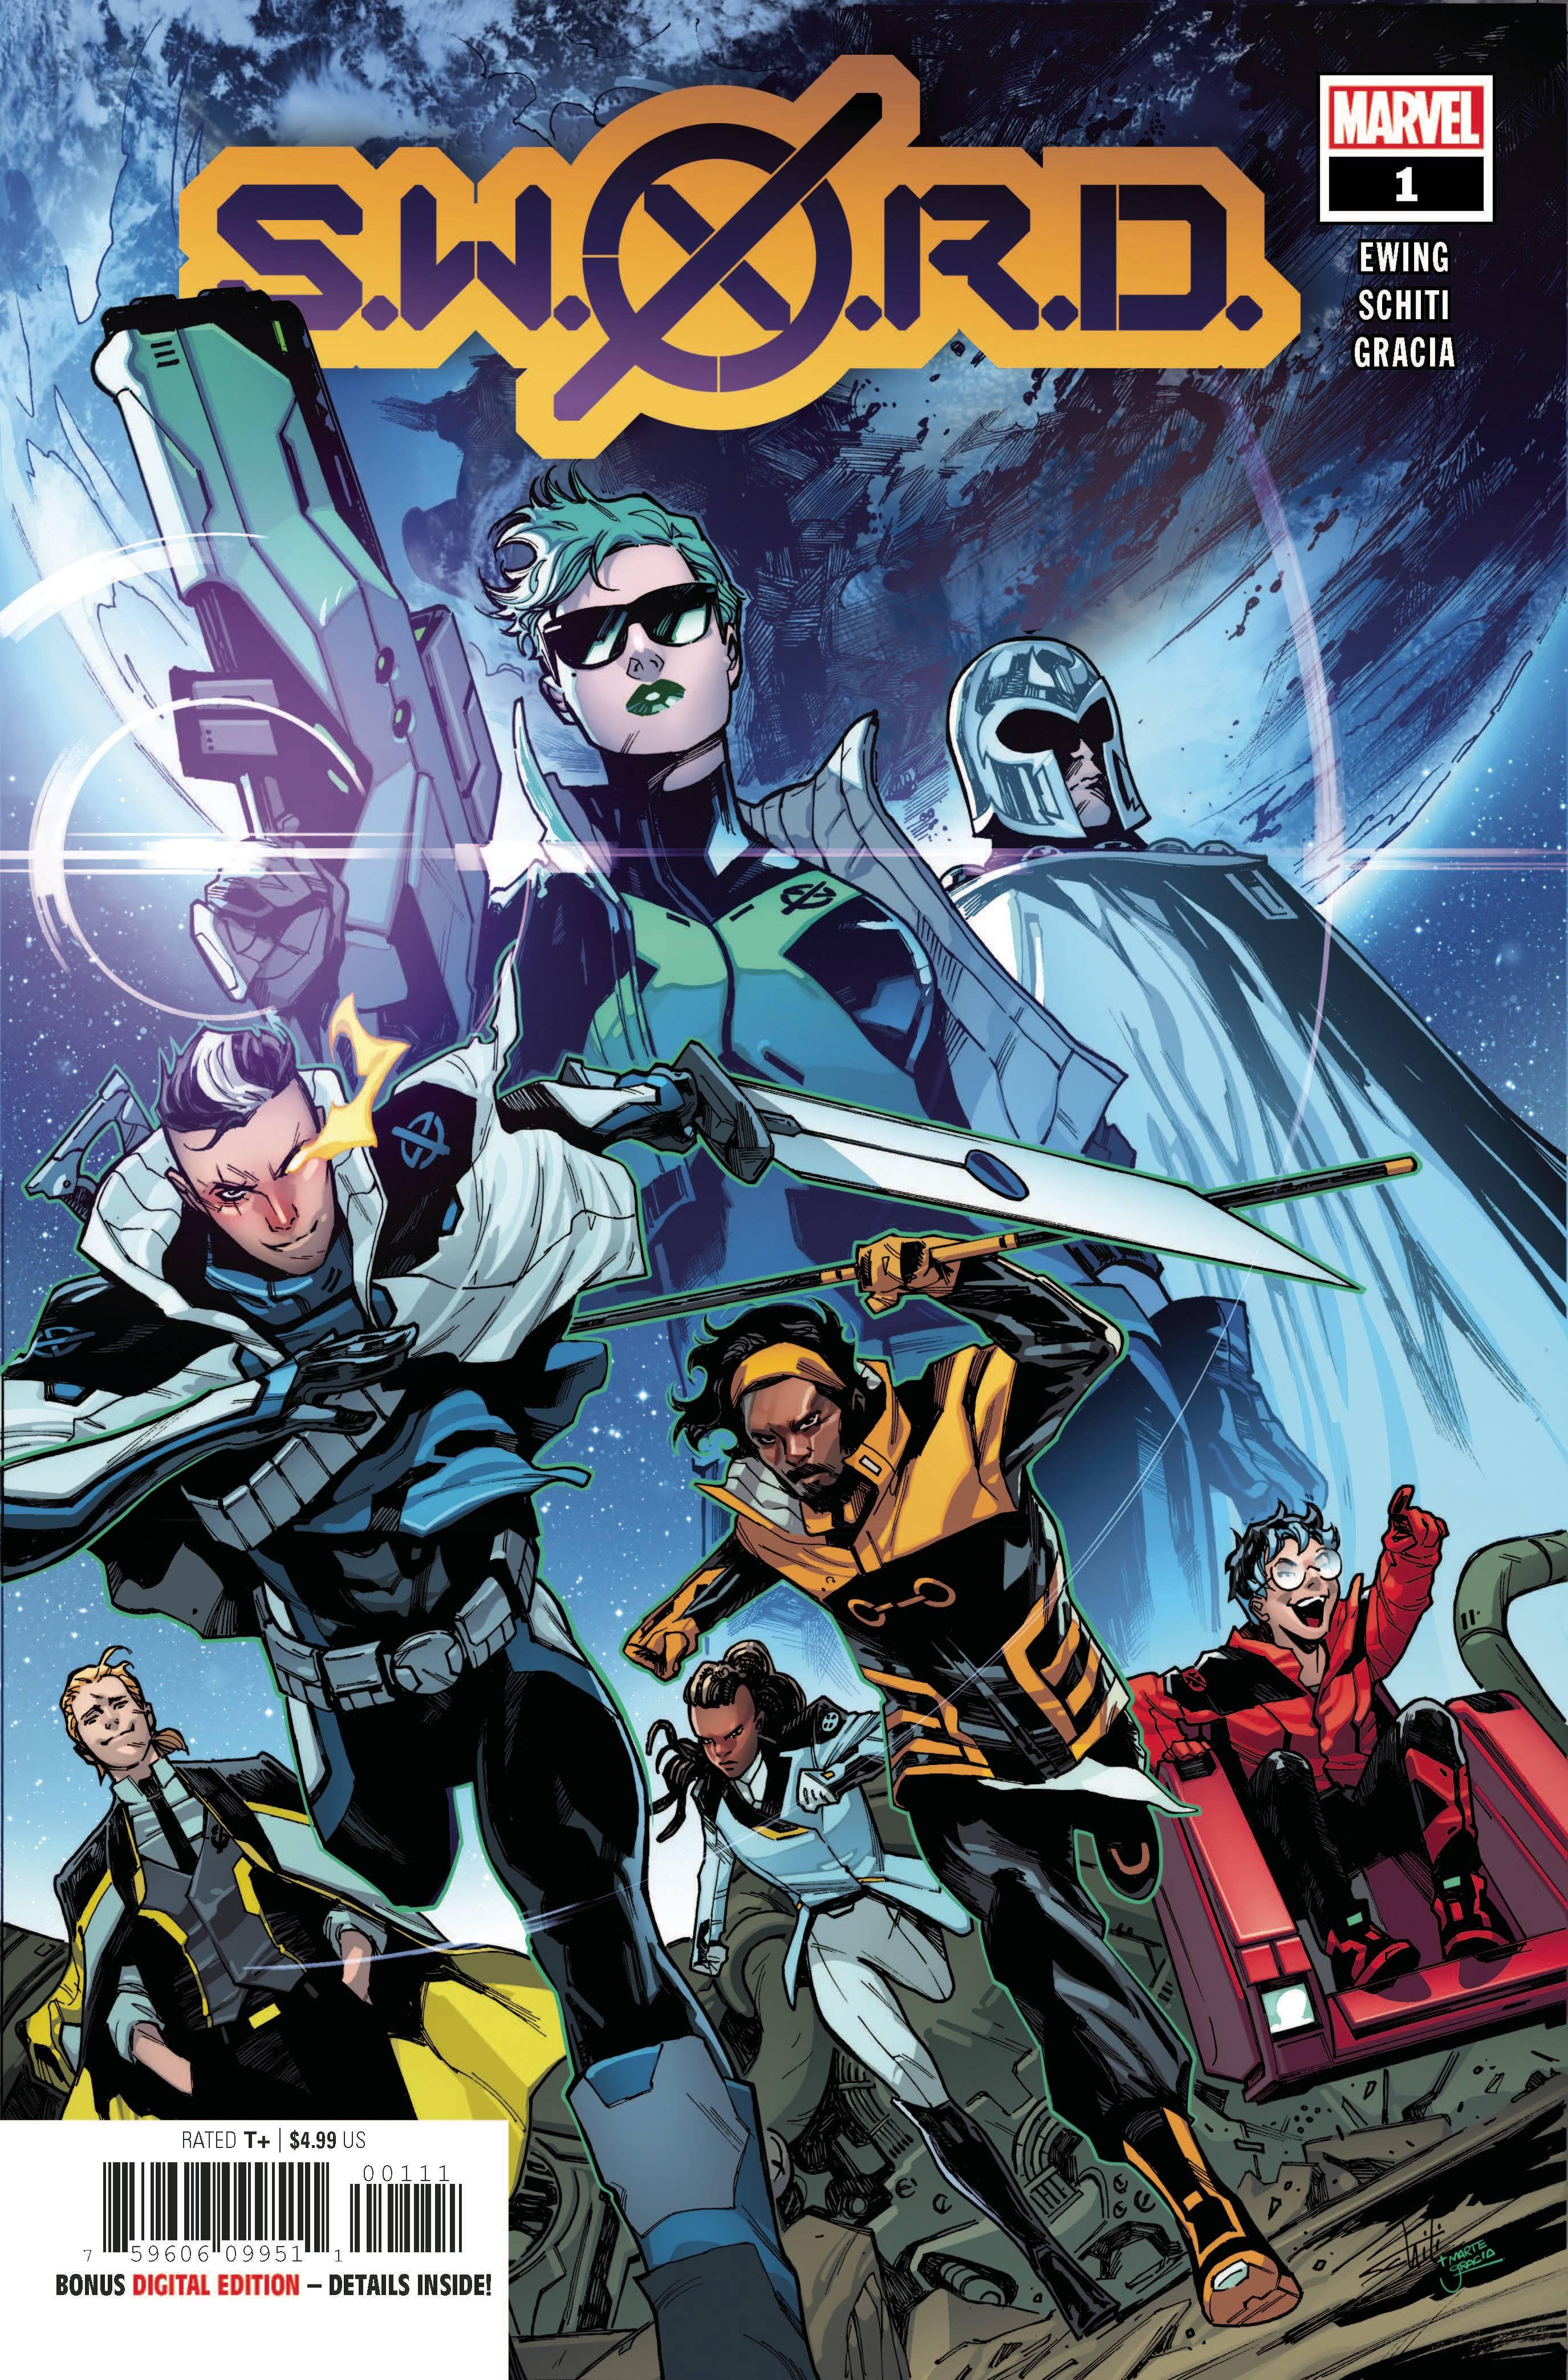 S.W.O.R.D. #1-Marvel Comics(2020)